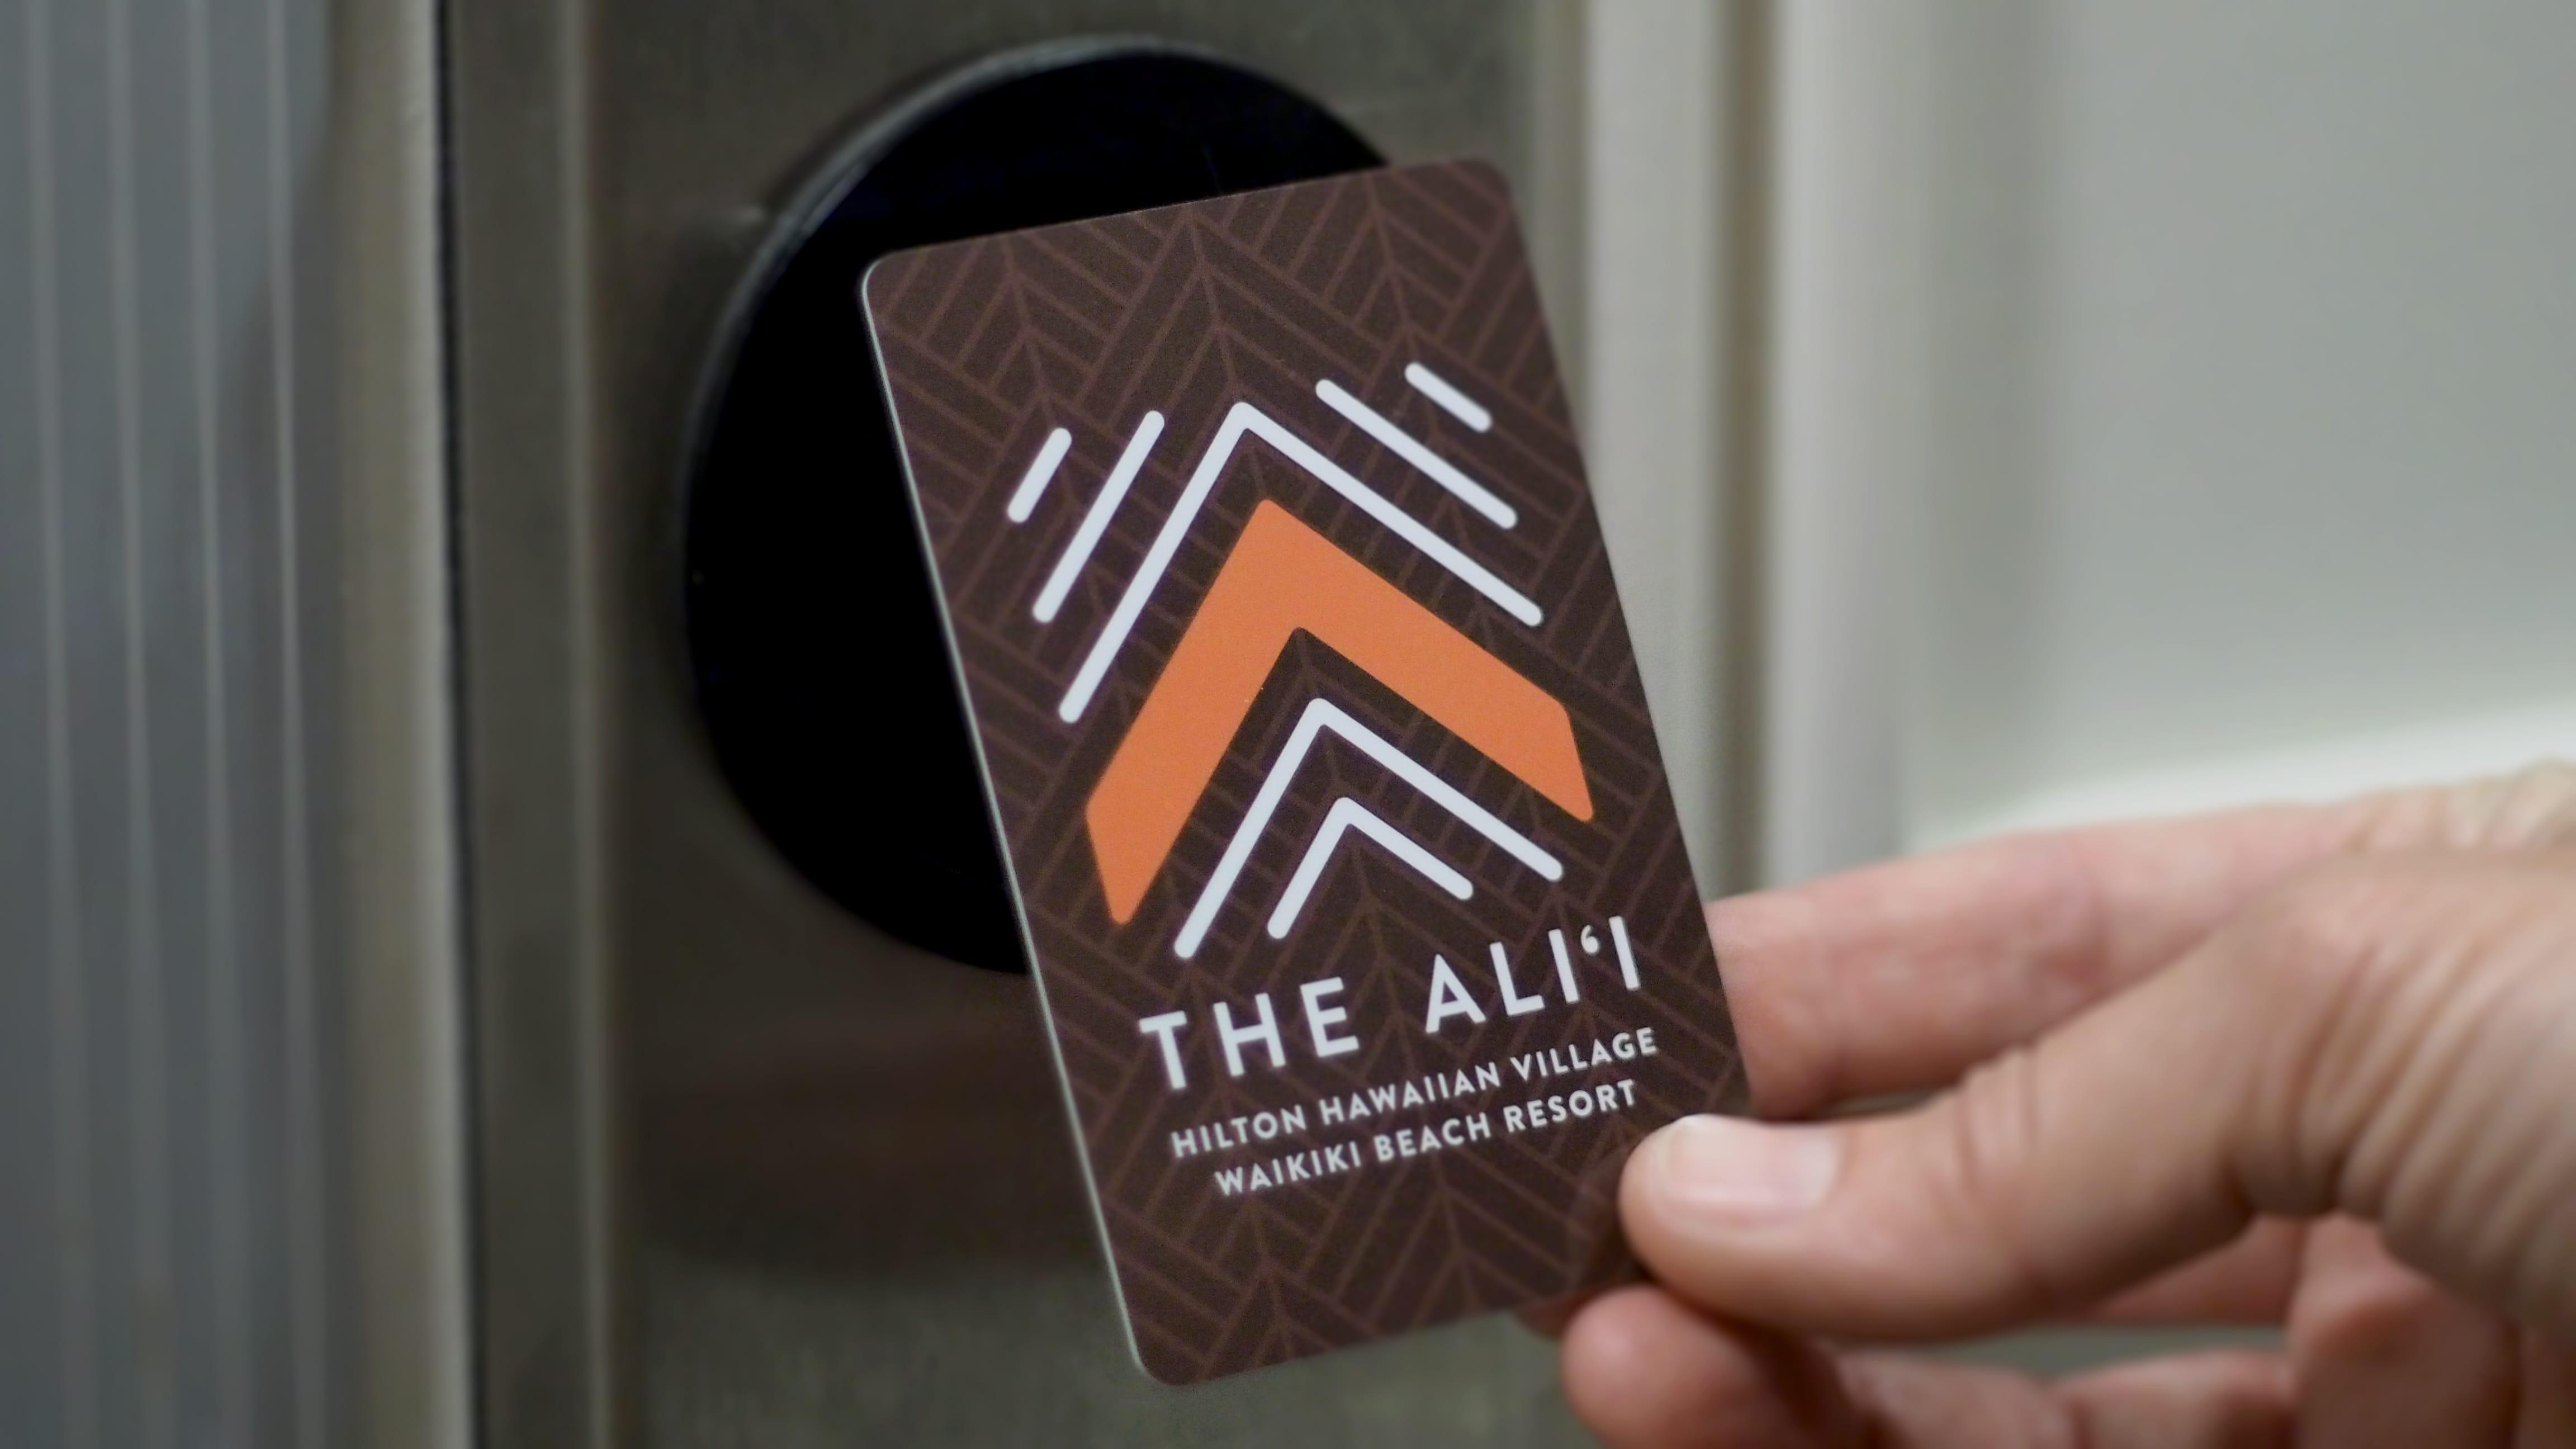 The Ali'i Keycard